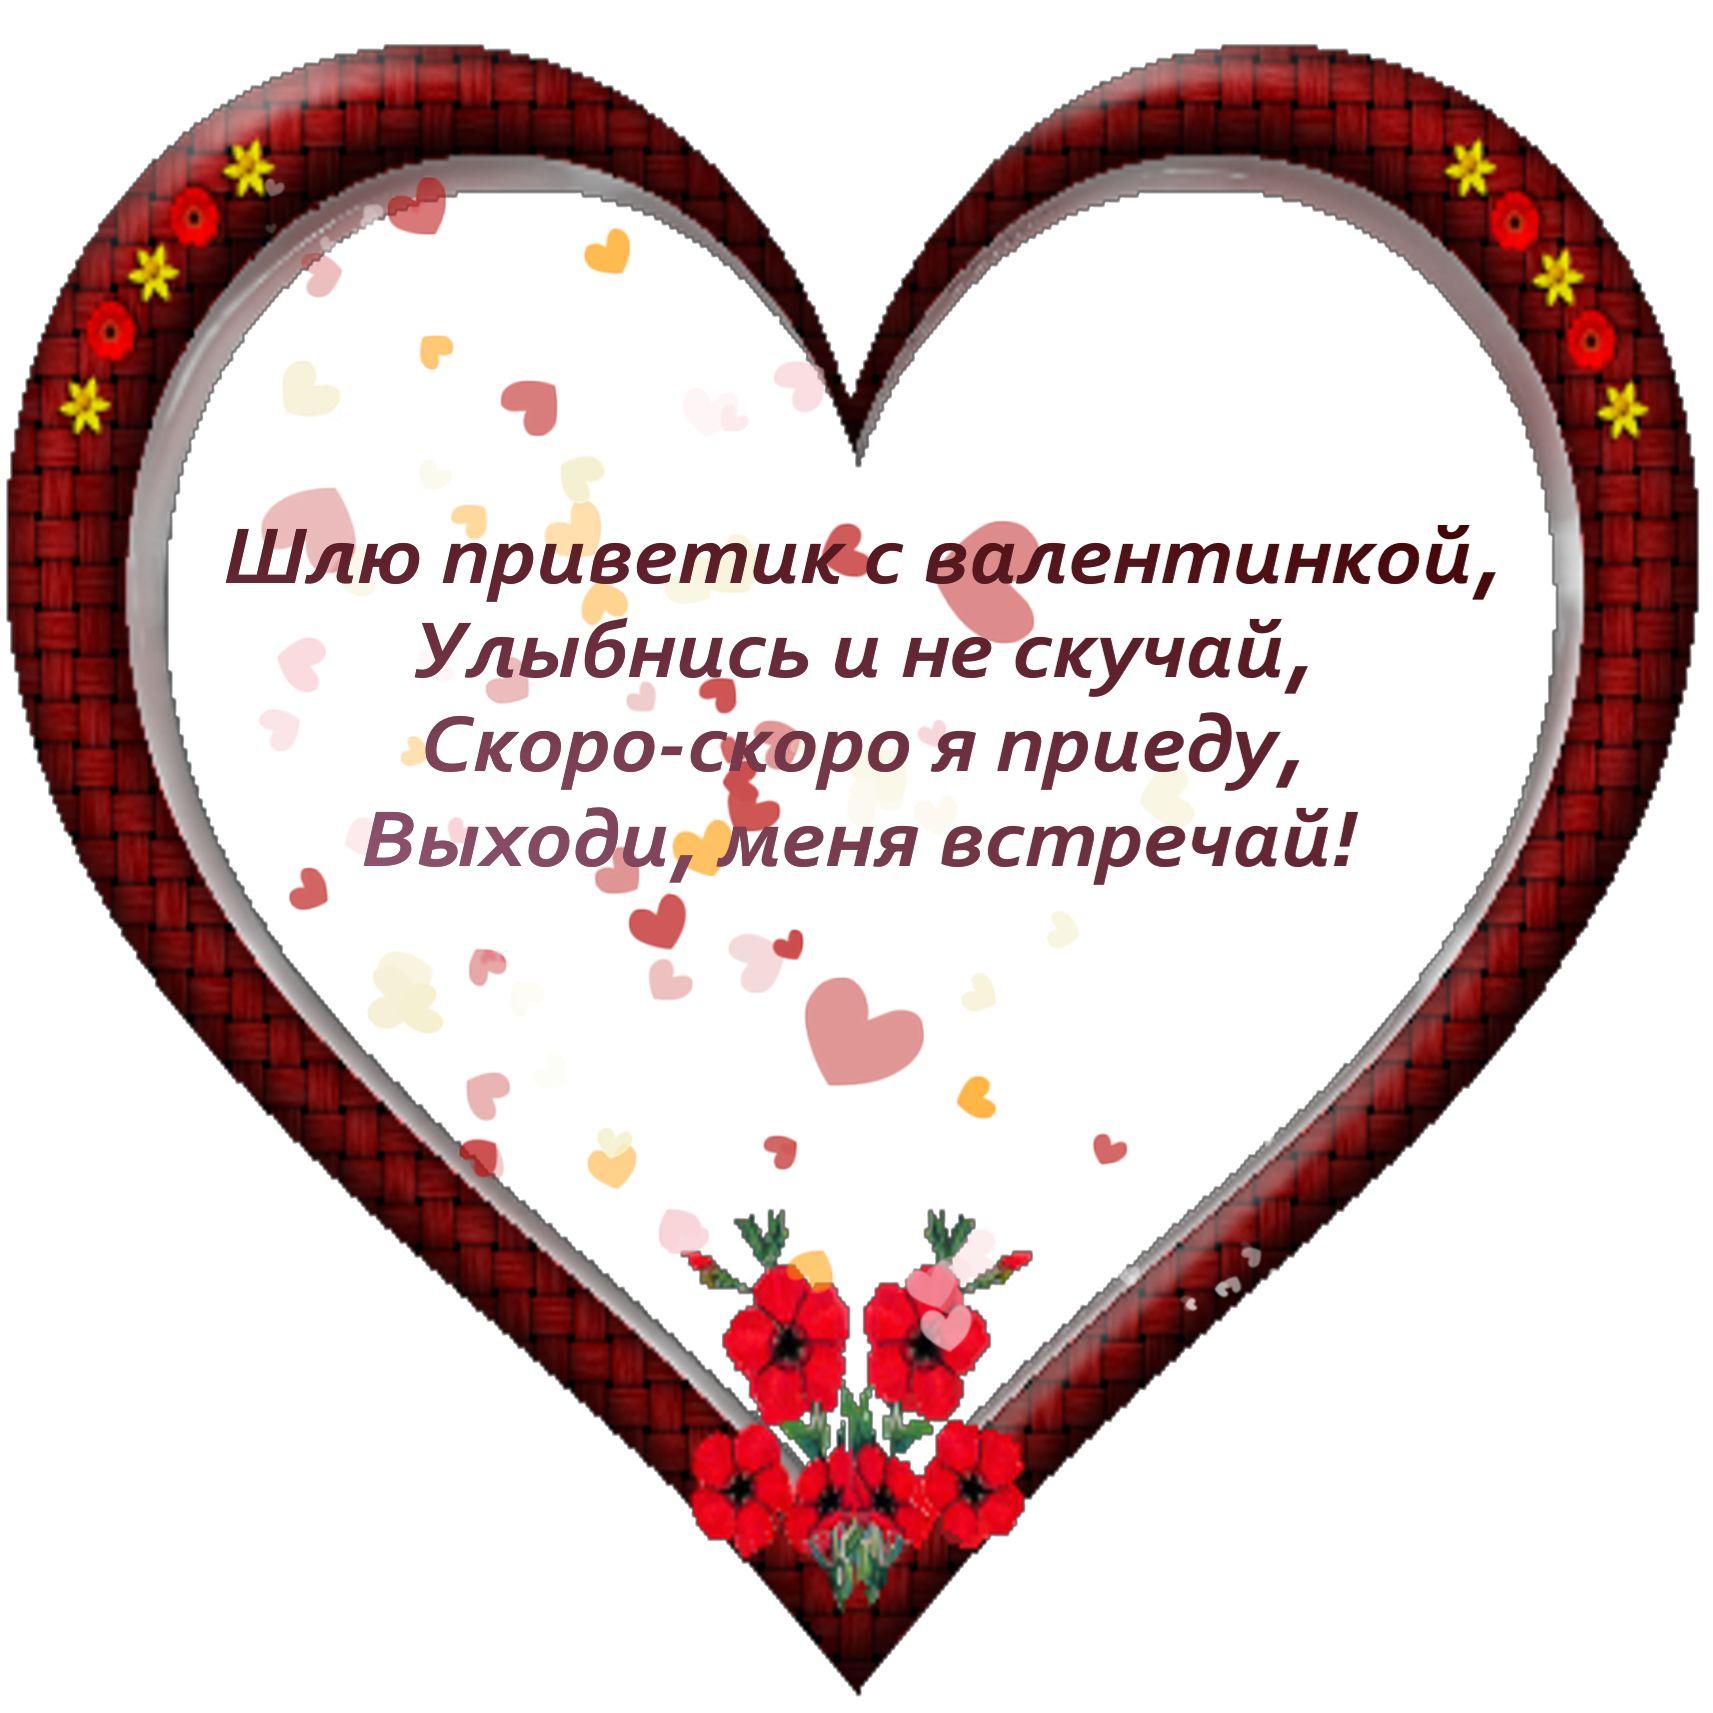 Валентинки с днем святого валентина